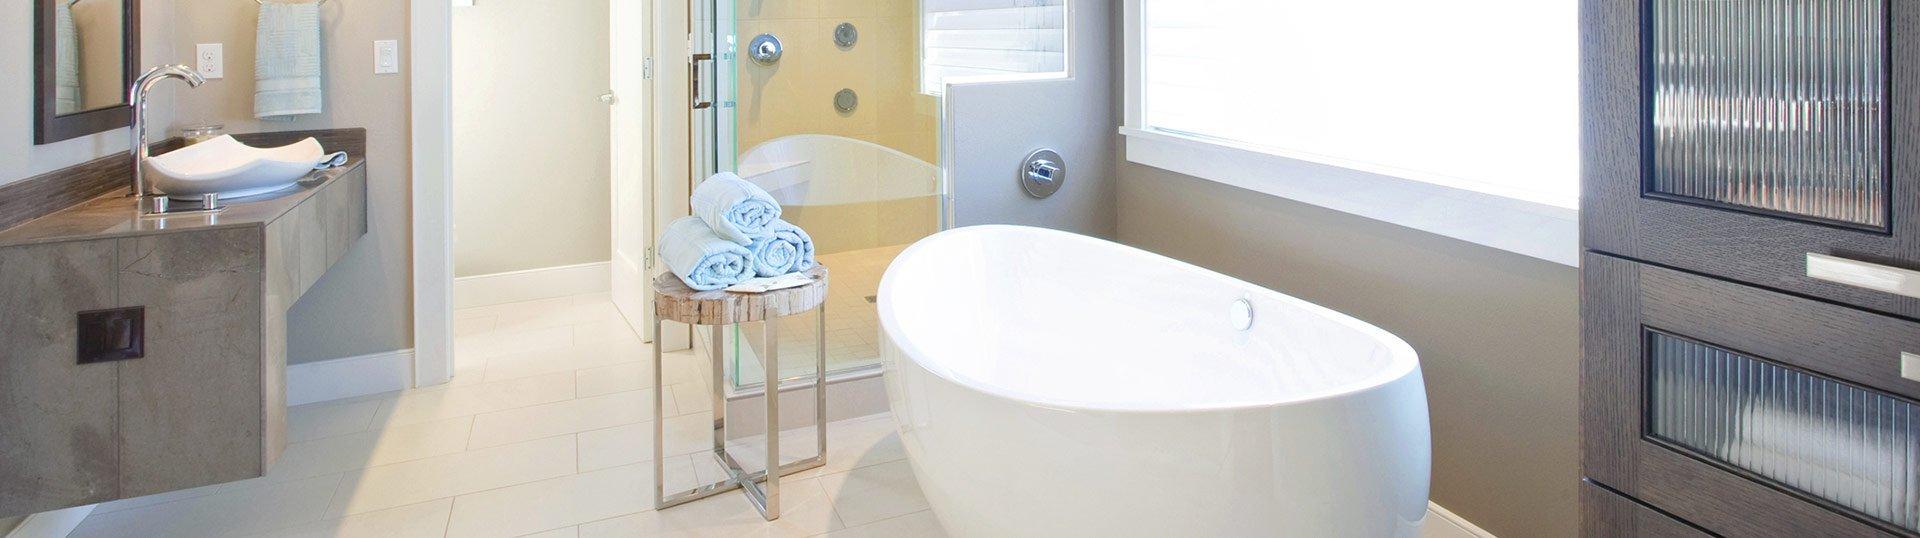 Home Remodeling - Bathroom